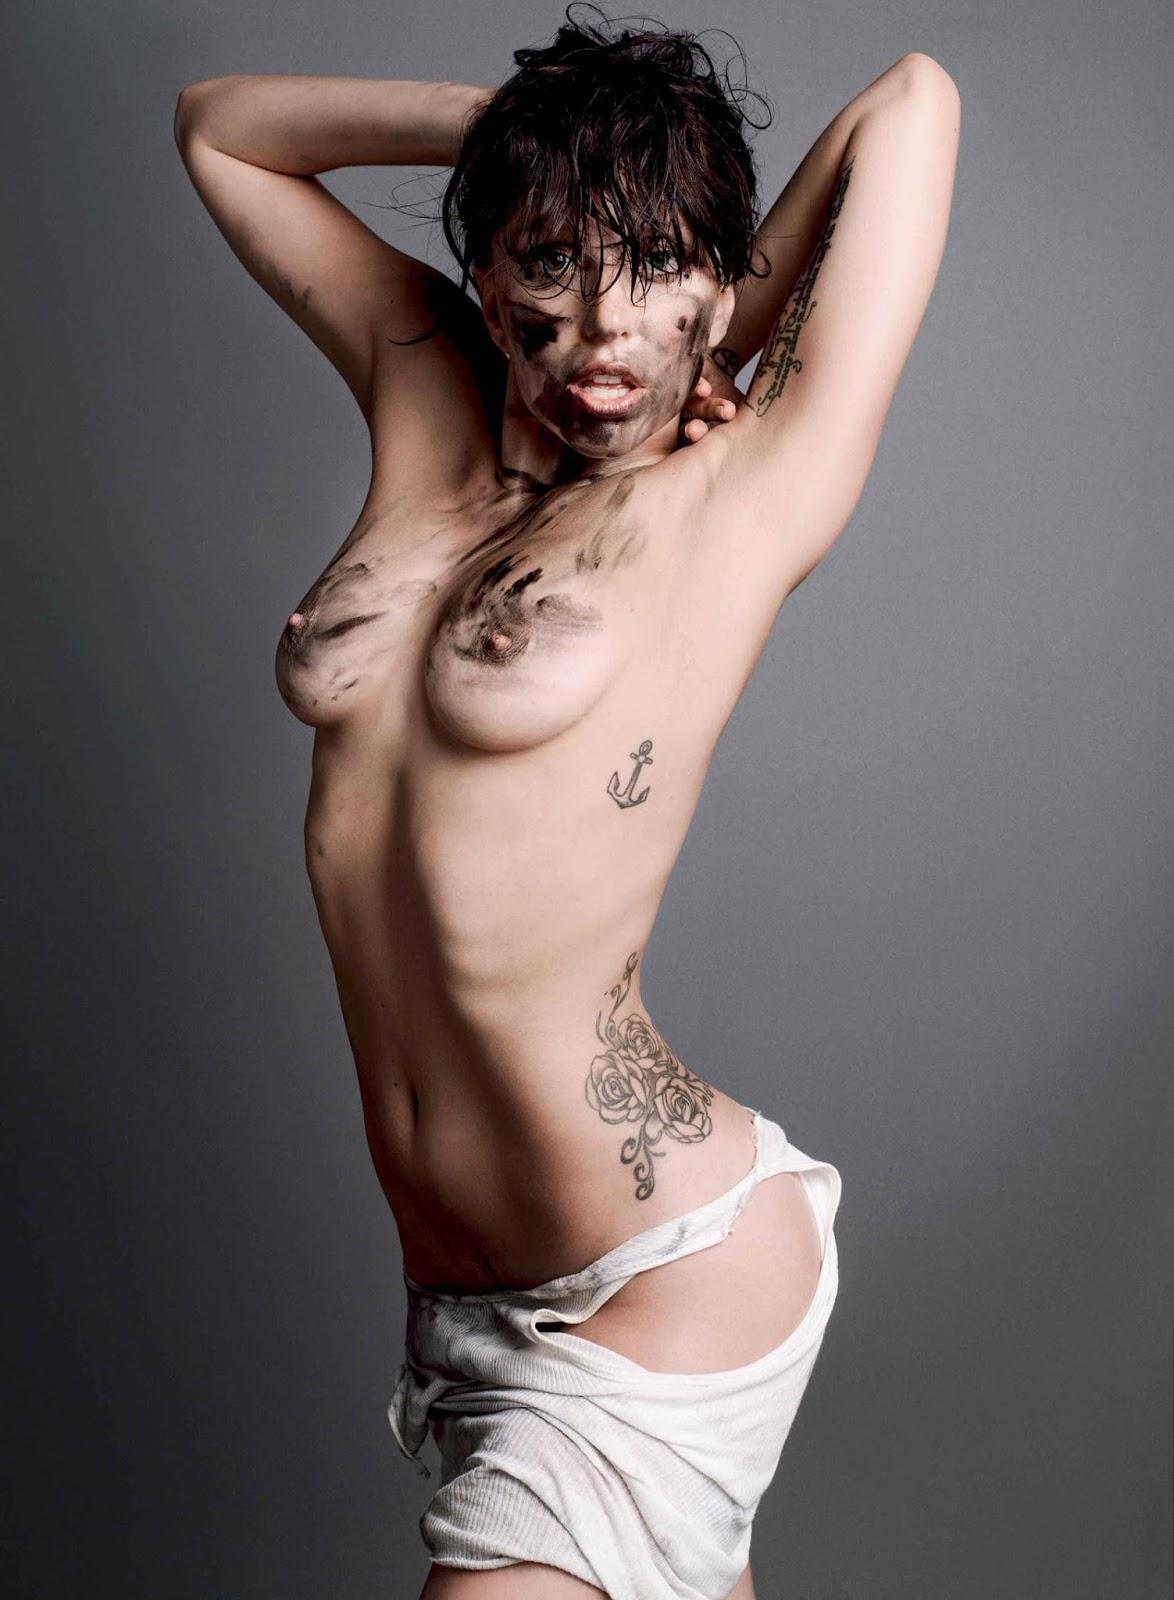 http://2.bp.blogspot.com/-hlRDnJCUtXs/UhZmz1AXH8I/AAAAAAAANrQ/d3XZcLtx1t0/s1600/Lady-Gaga-1.jpg